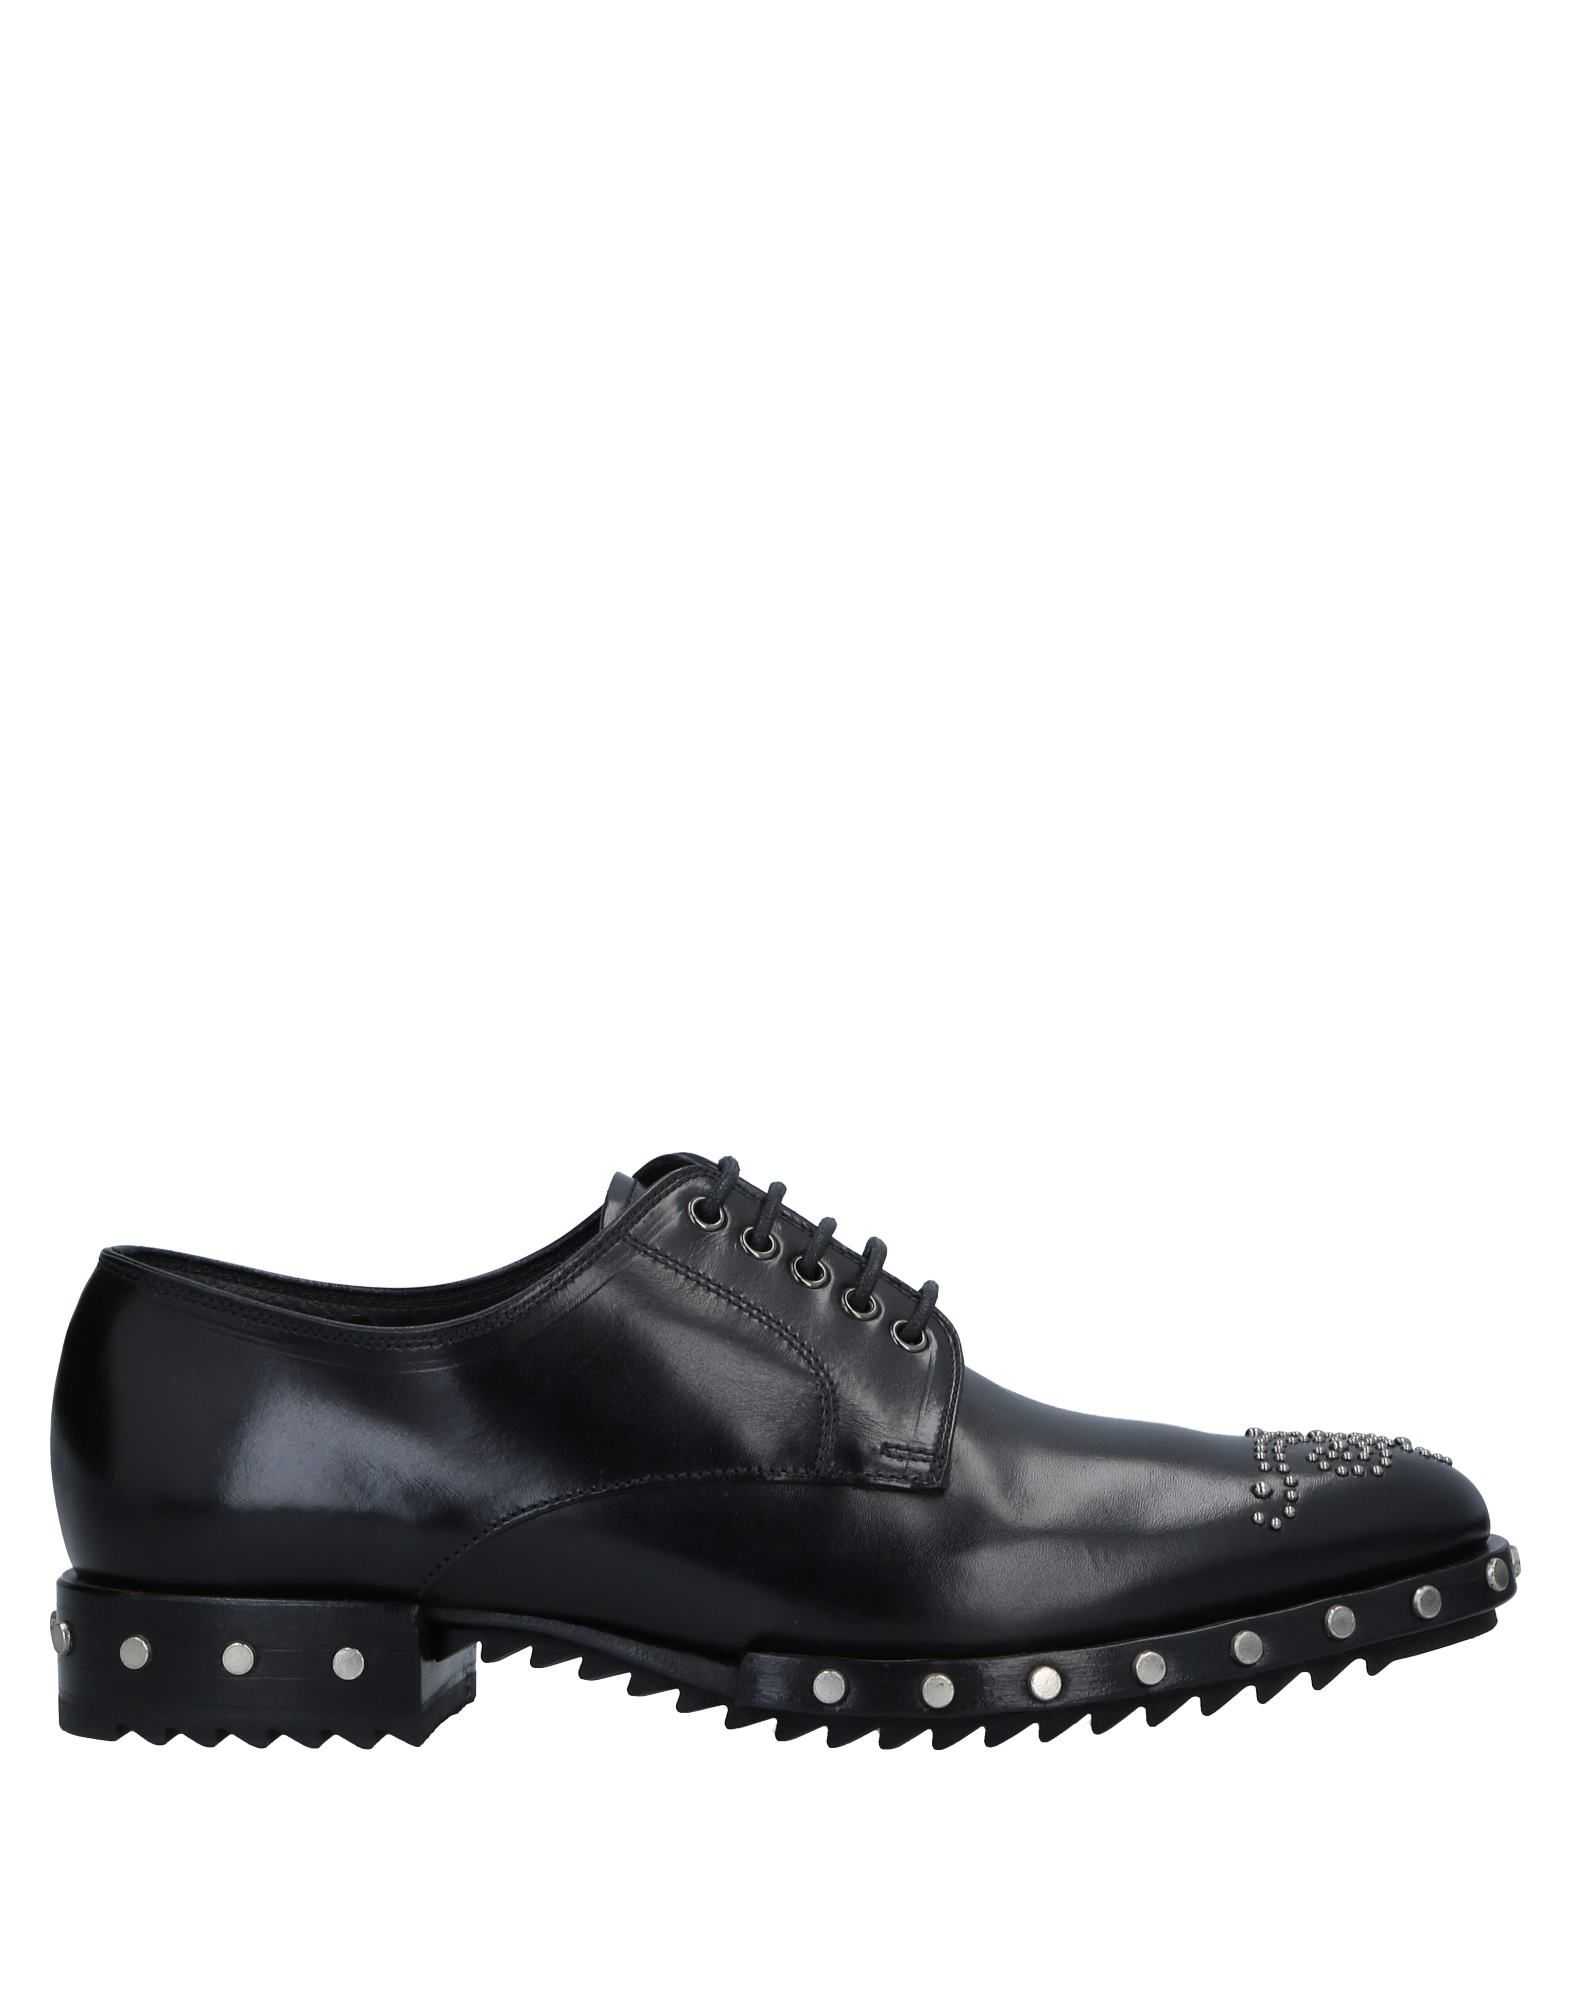 Ermanno Scervino Laced shoes